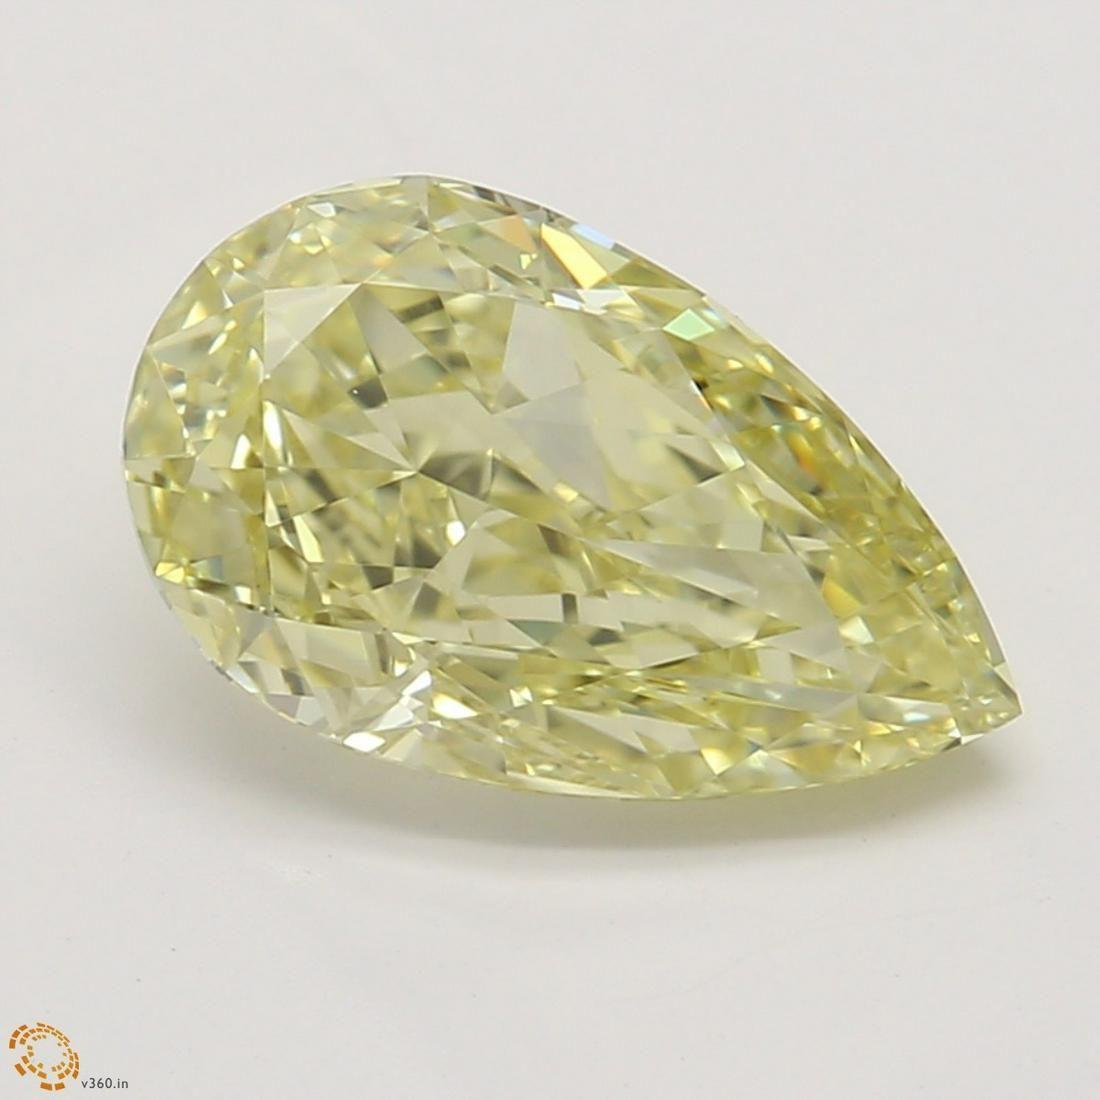 1.35 ct, Yellow/VVS1, Pear cut GIA Graded Diamond